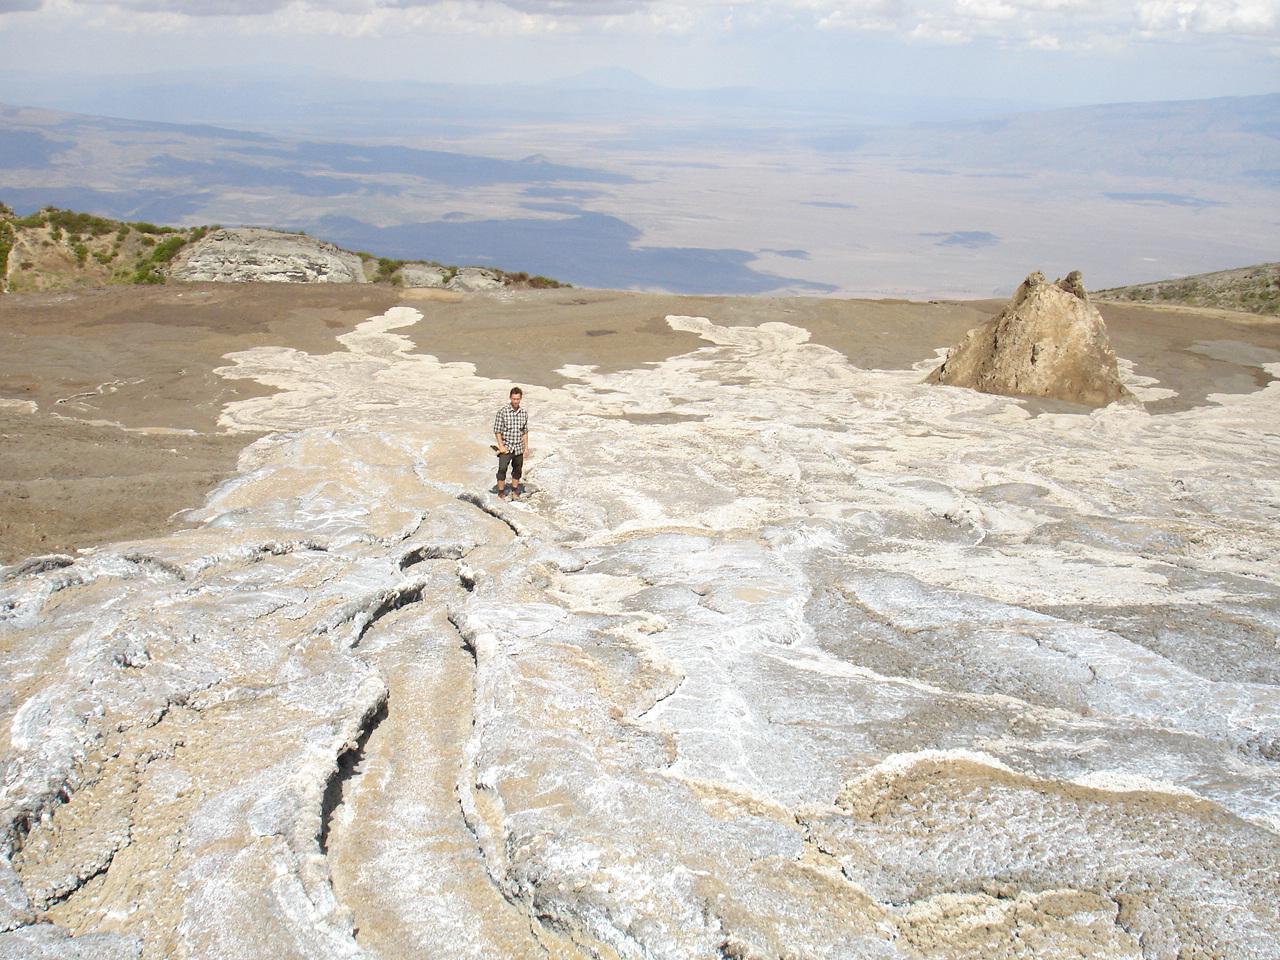 perierga.gr - Το πιο παράξενο ηφαίστειο στον κόσμο βγάζει… ασημί λάβα!